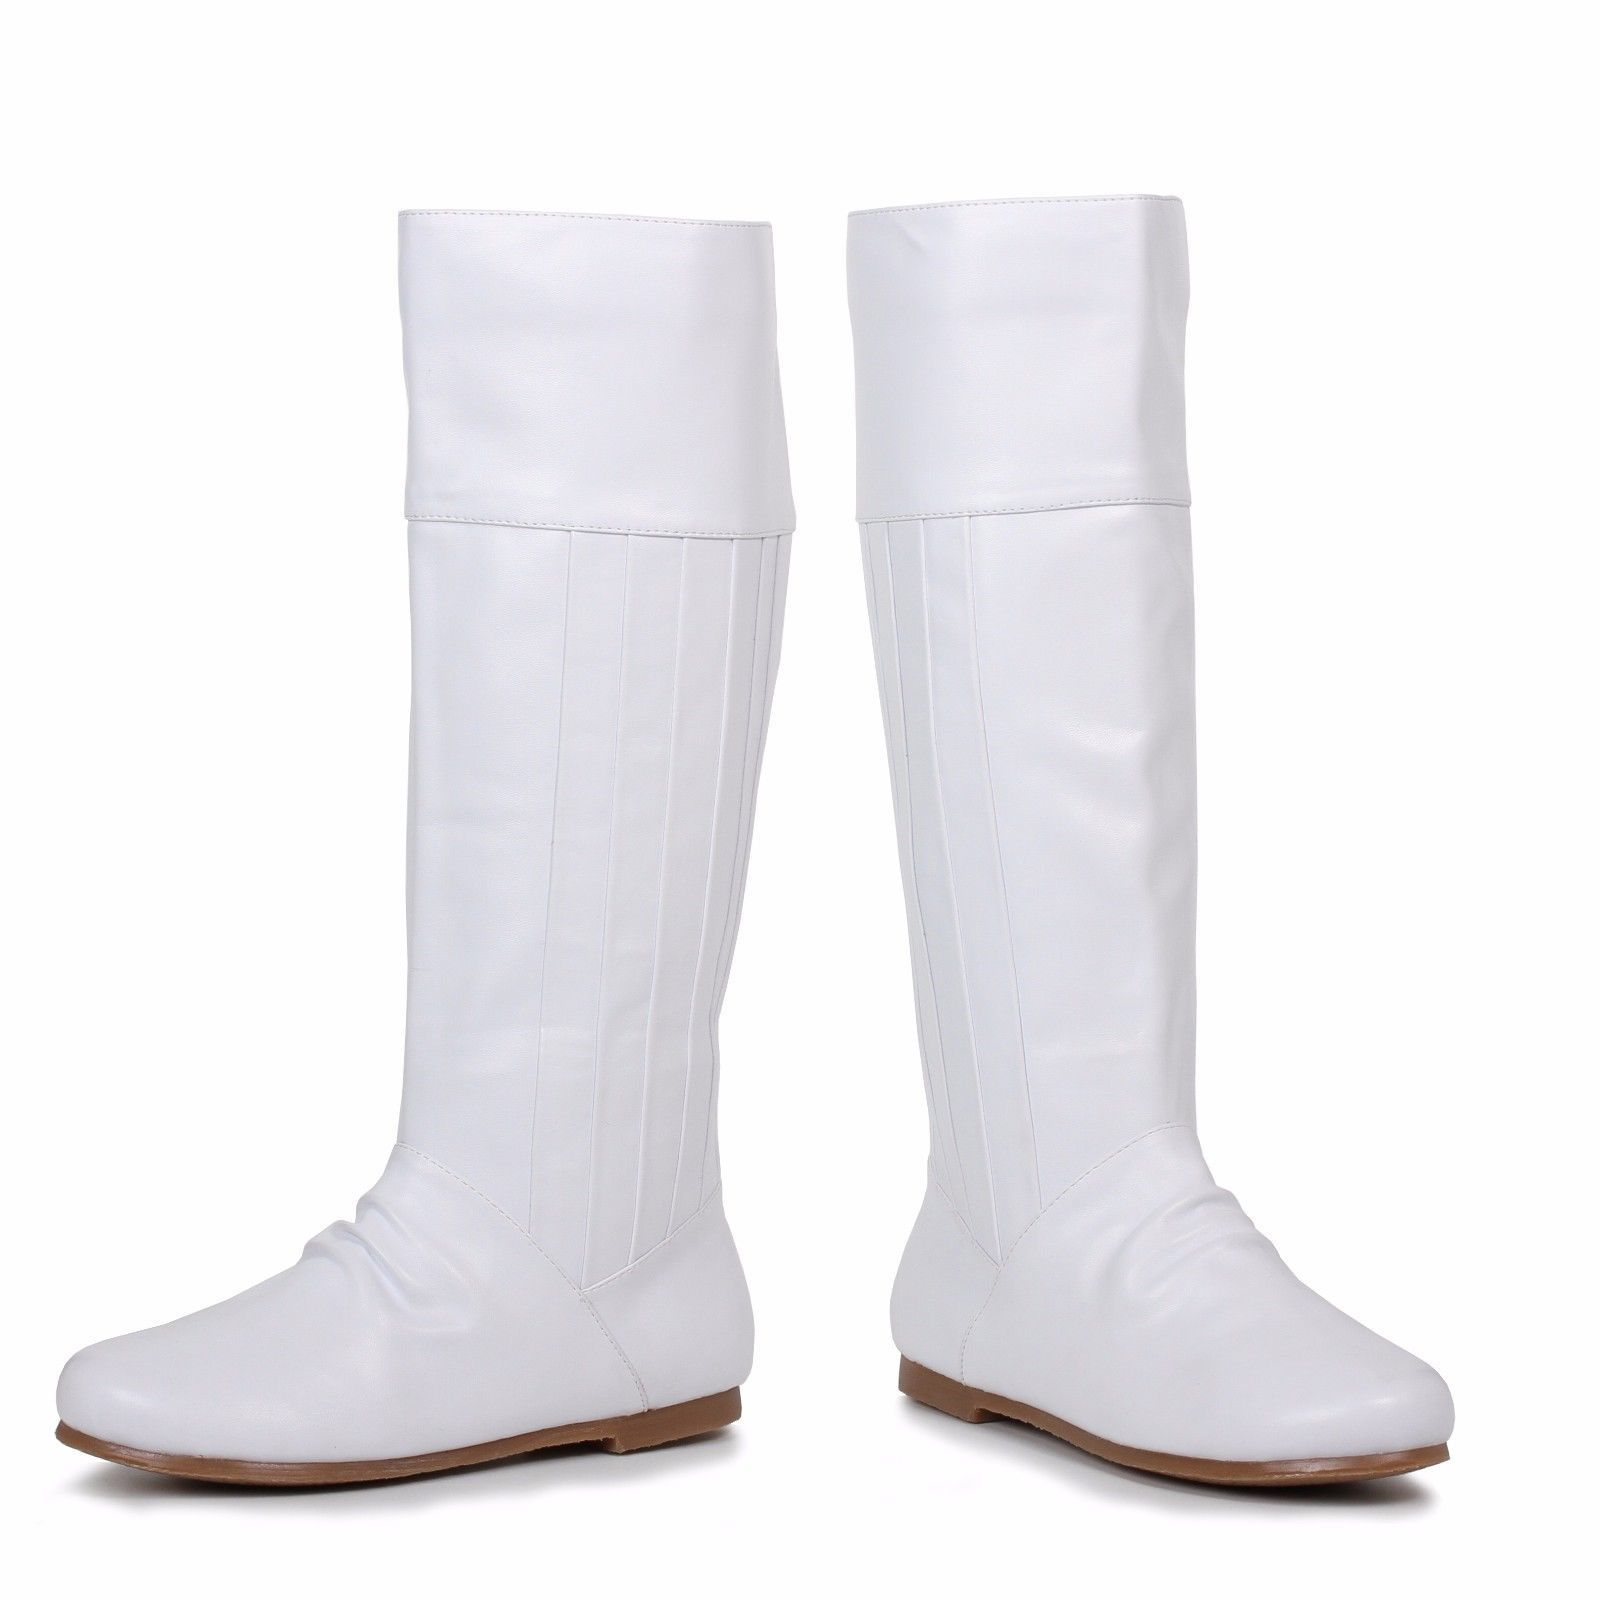 Ellie Shoes Leanna Heel Boot Shoe Halloween Sexy White Knee High Goth 105-LEANNA